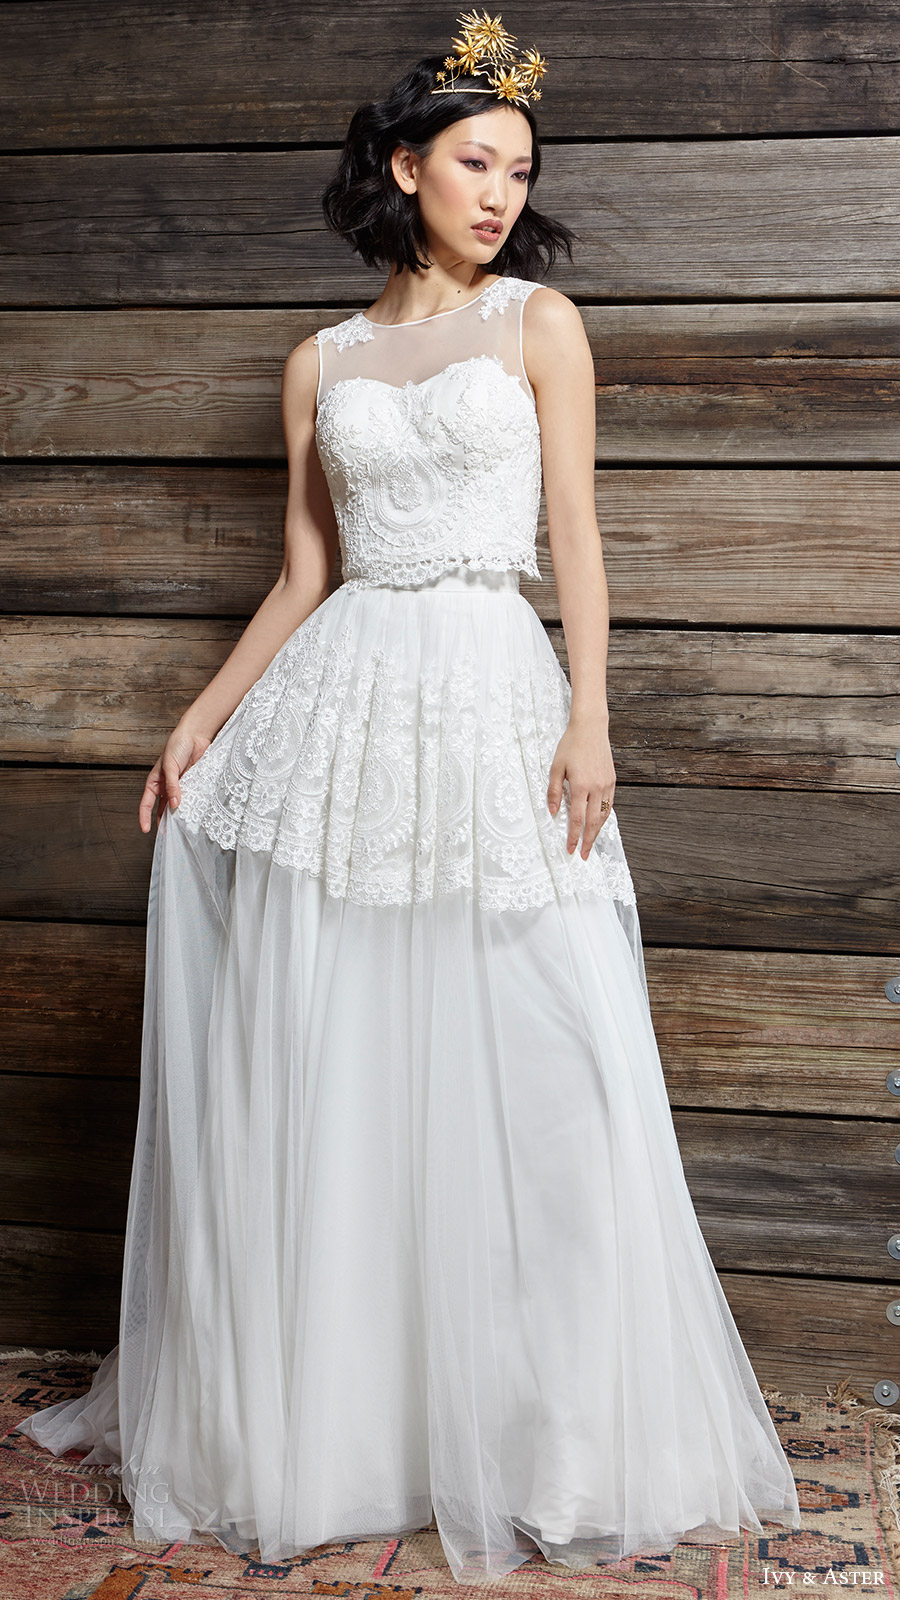 ivy aster bridal spring 2017 leighton sleeveless top lillian skirt